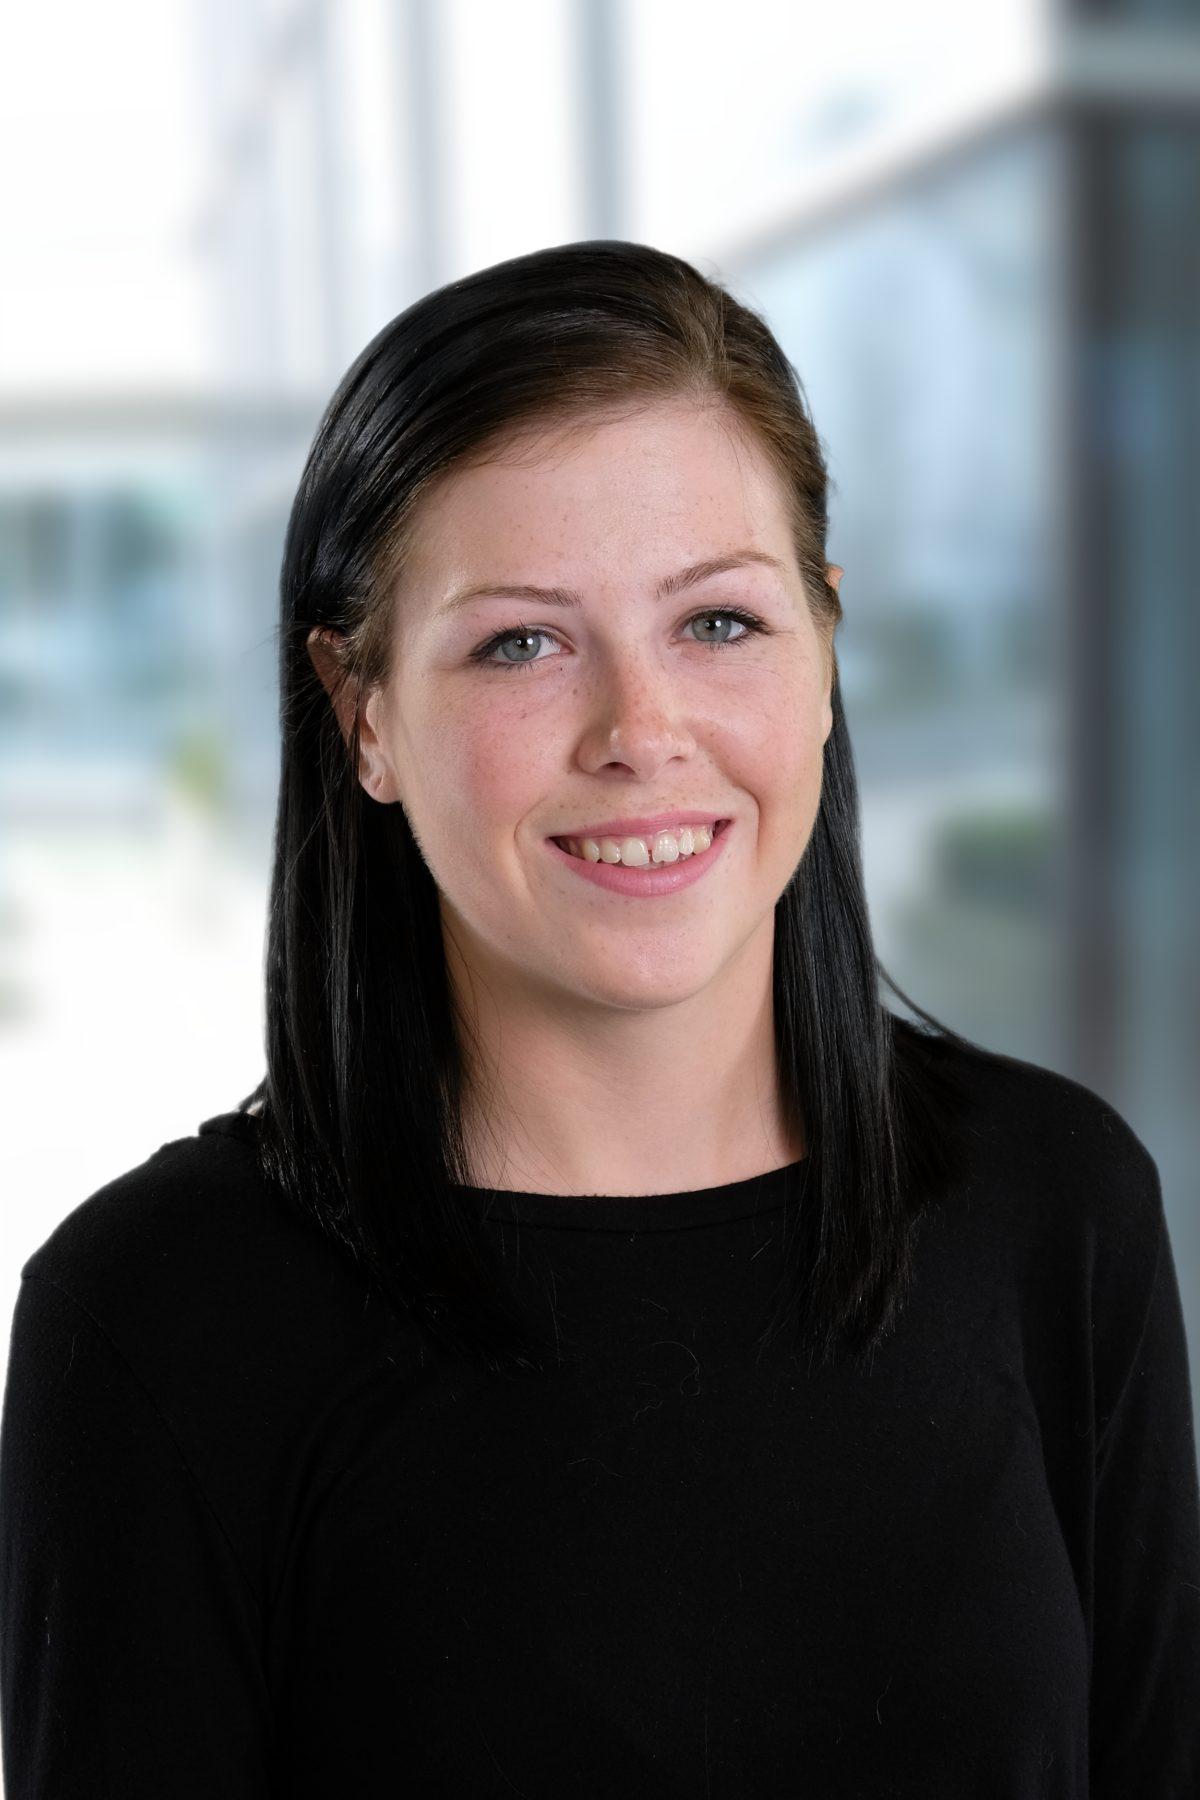 Desiree-helder-Project-Coordinator Our Team